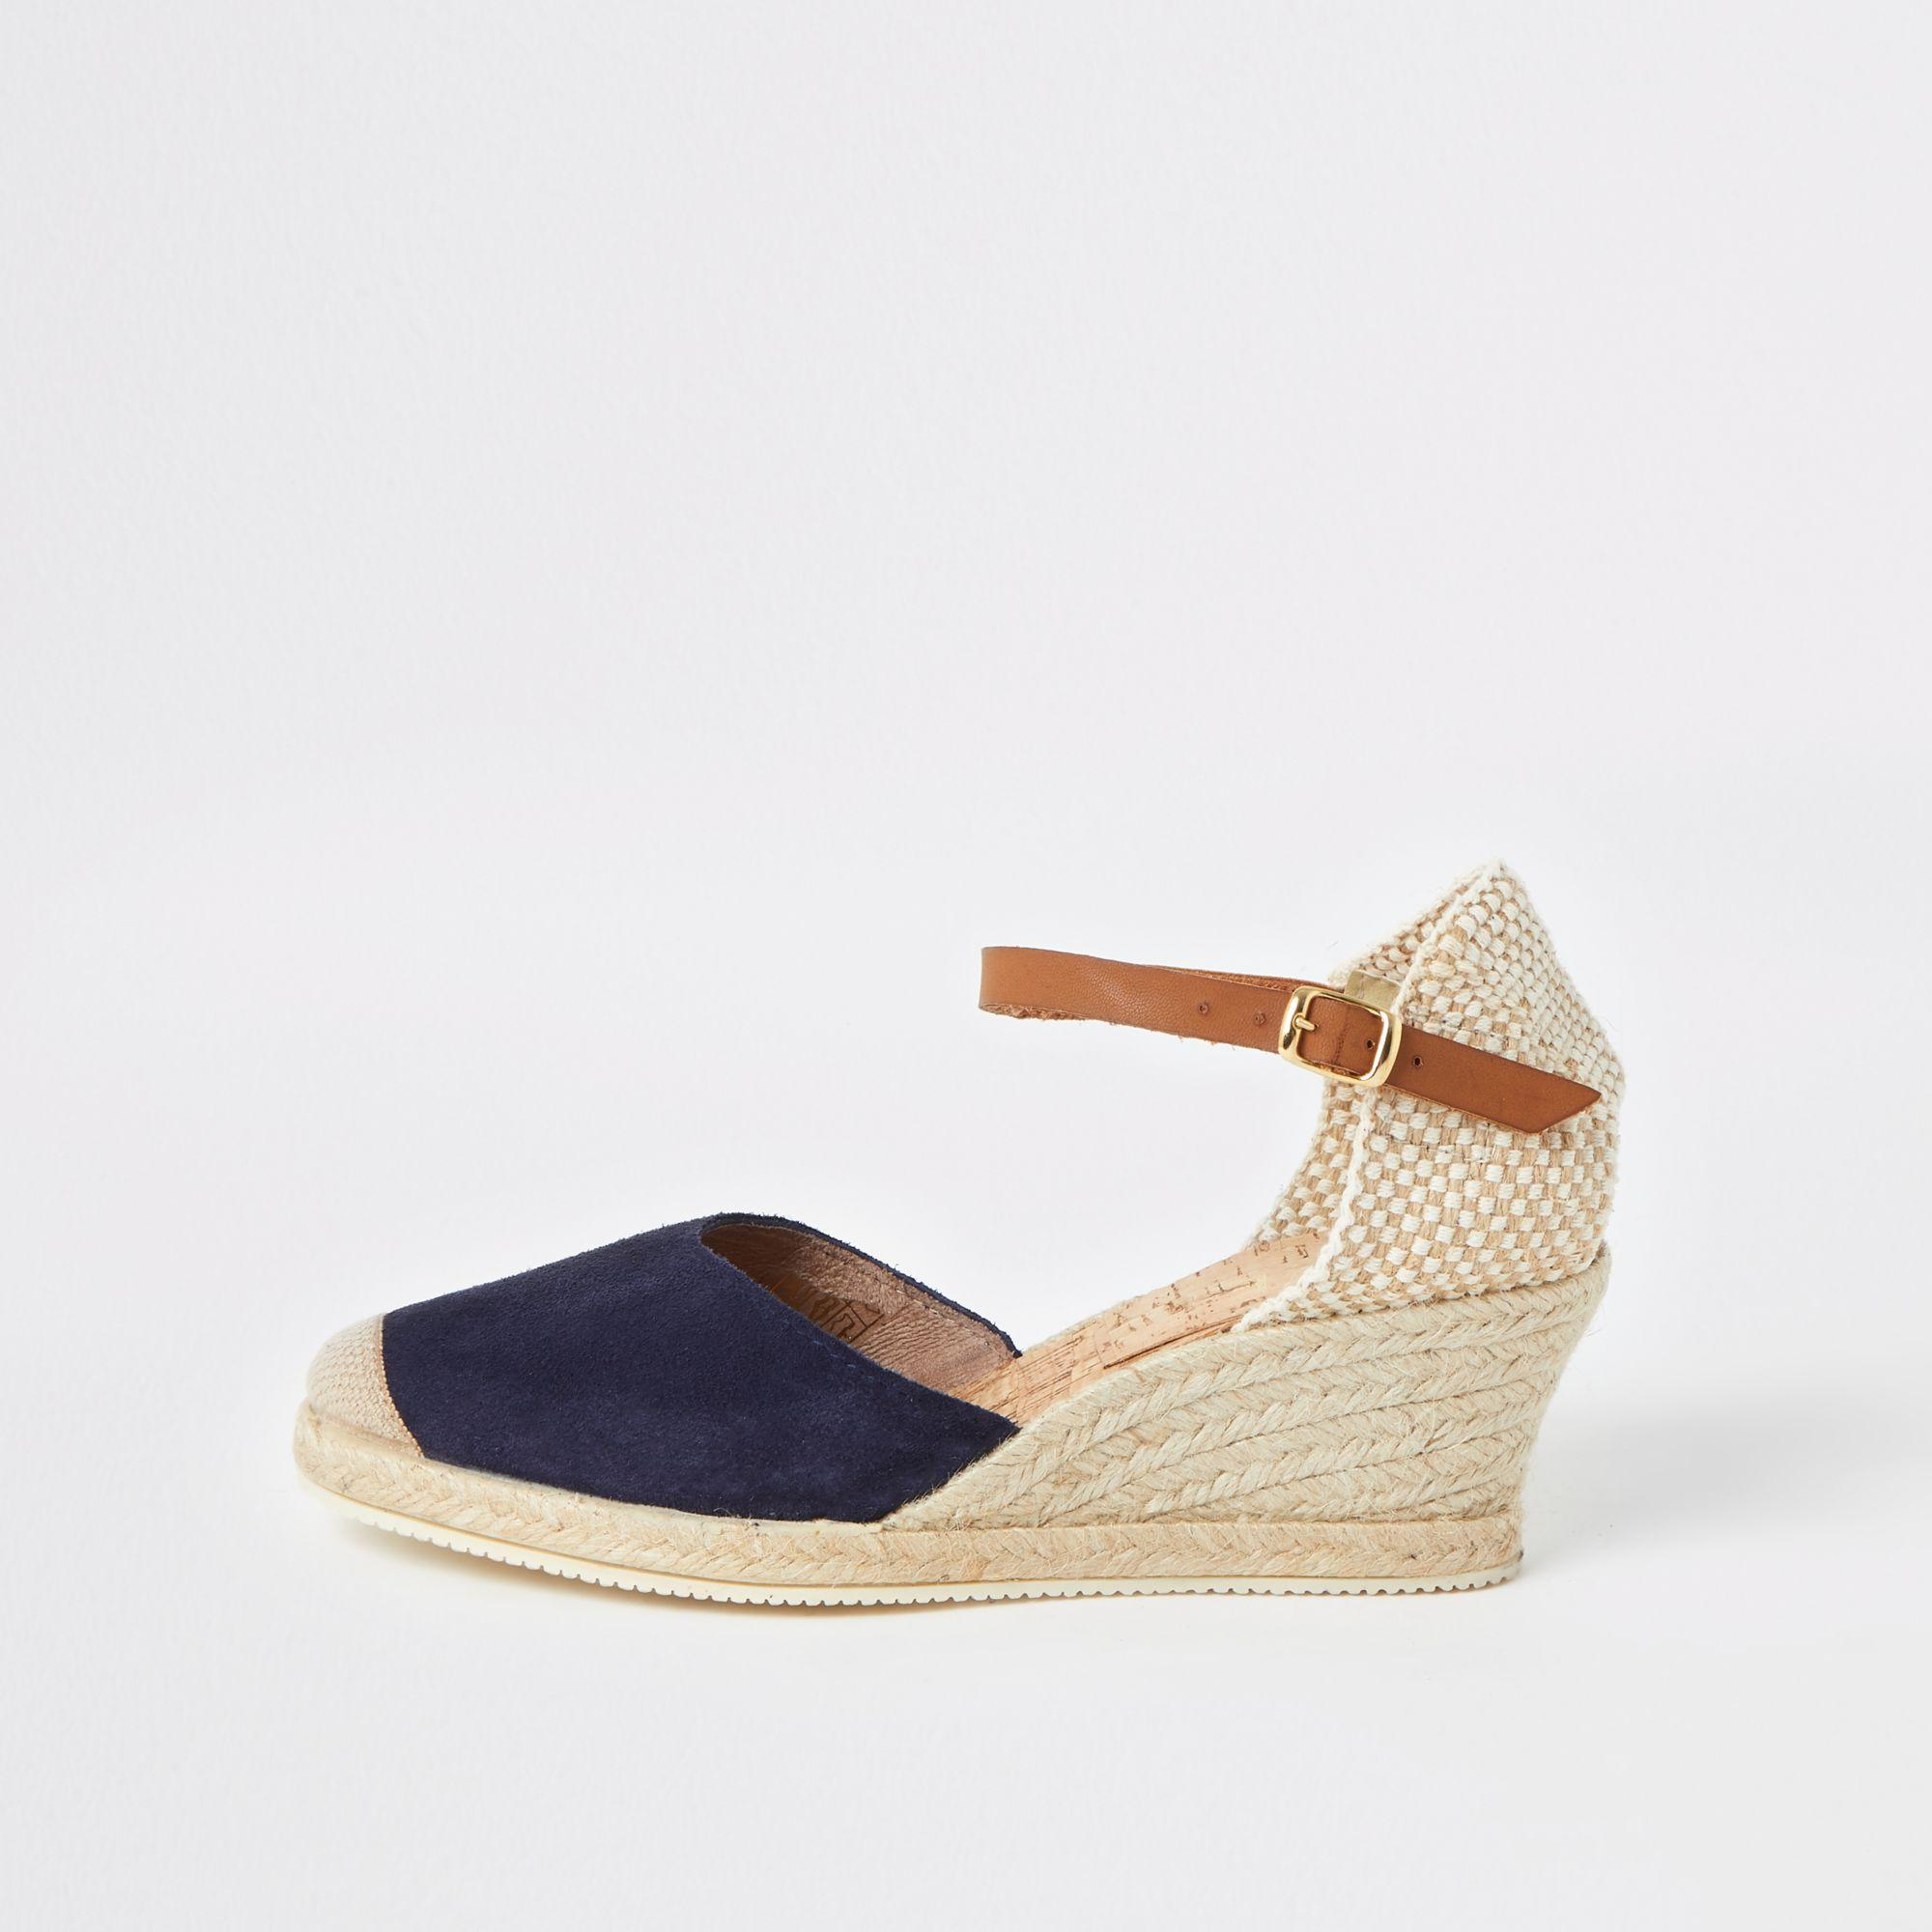 f6db1241b7 River Island Ravel Espadrille Wedge Sandals in Blue - Lyst